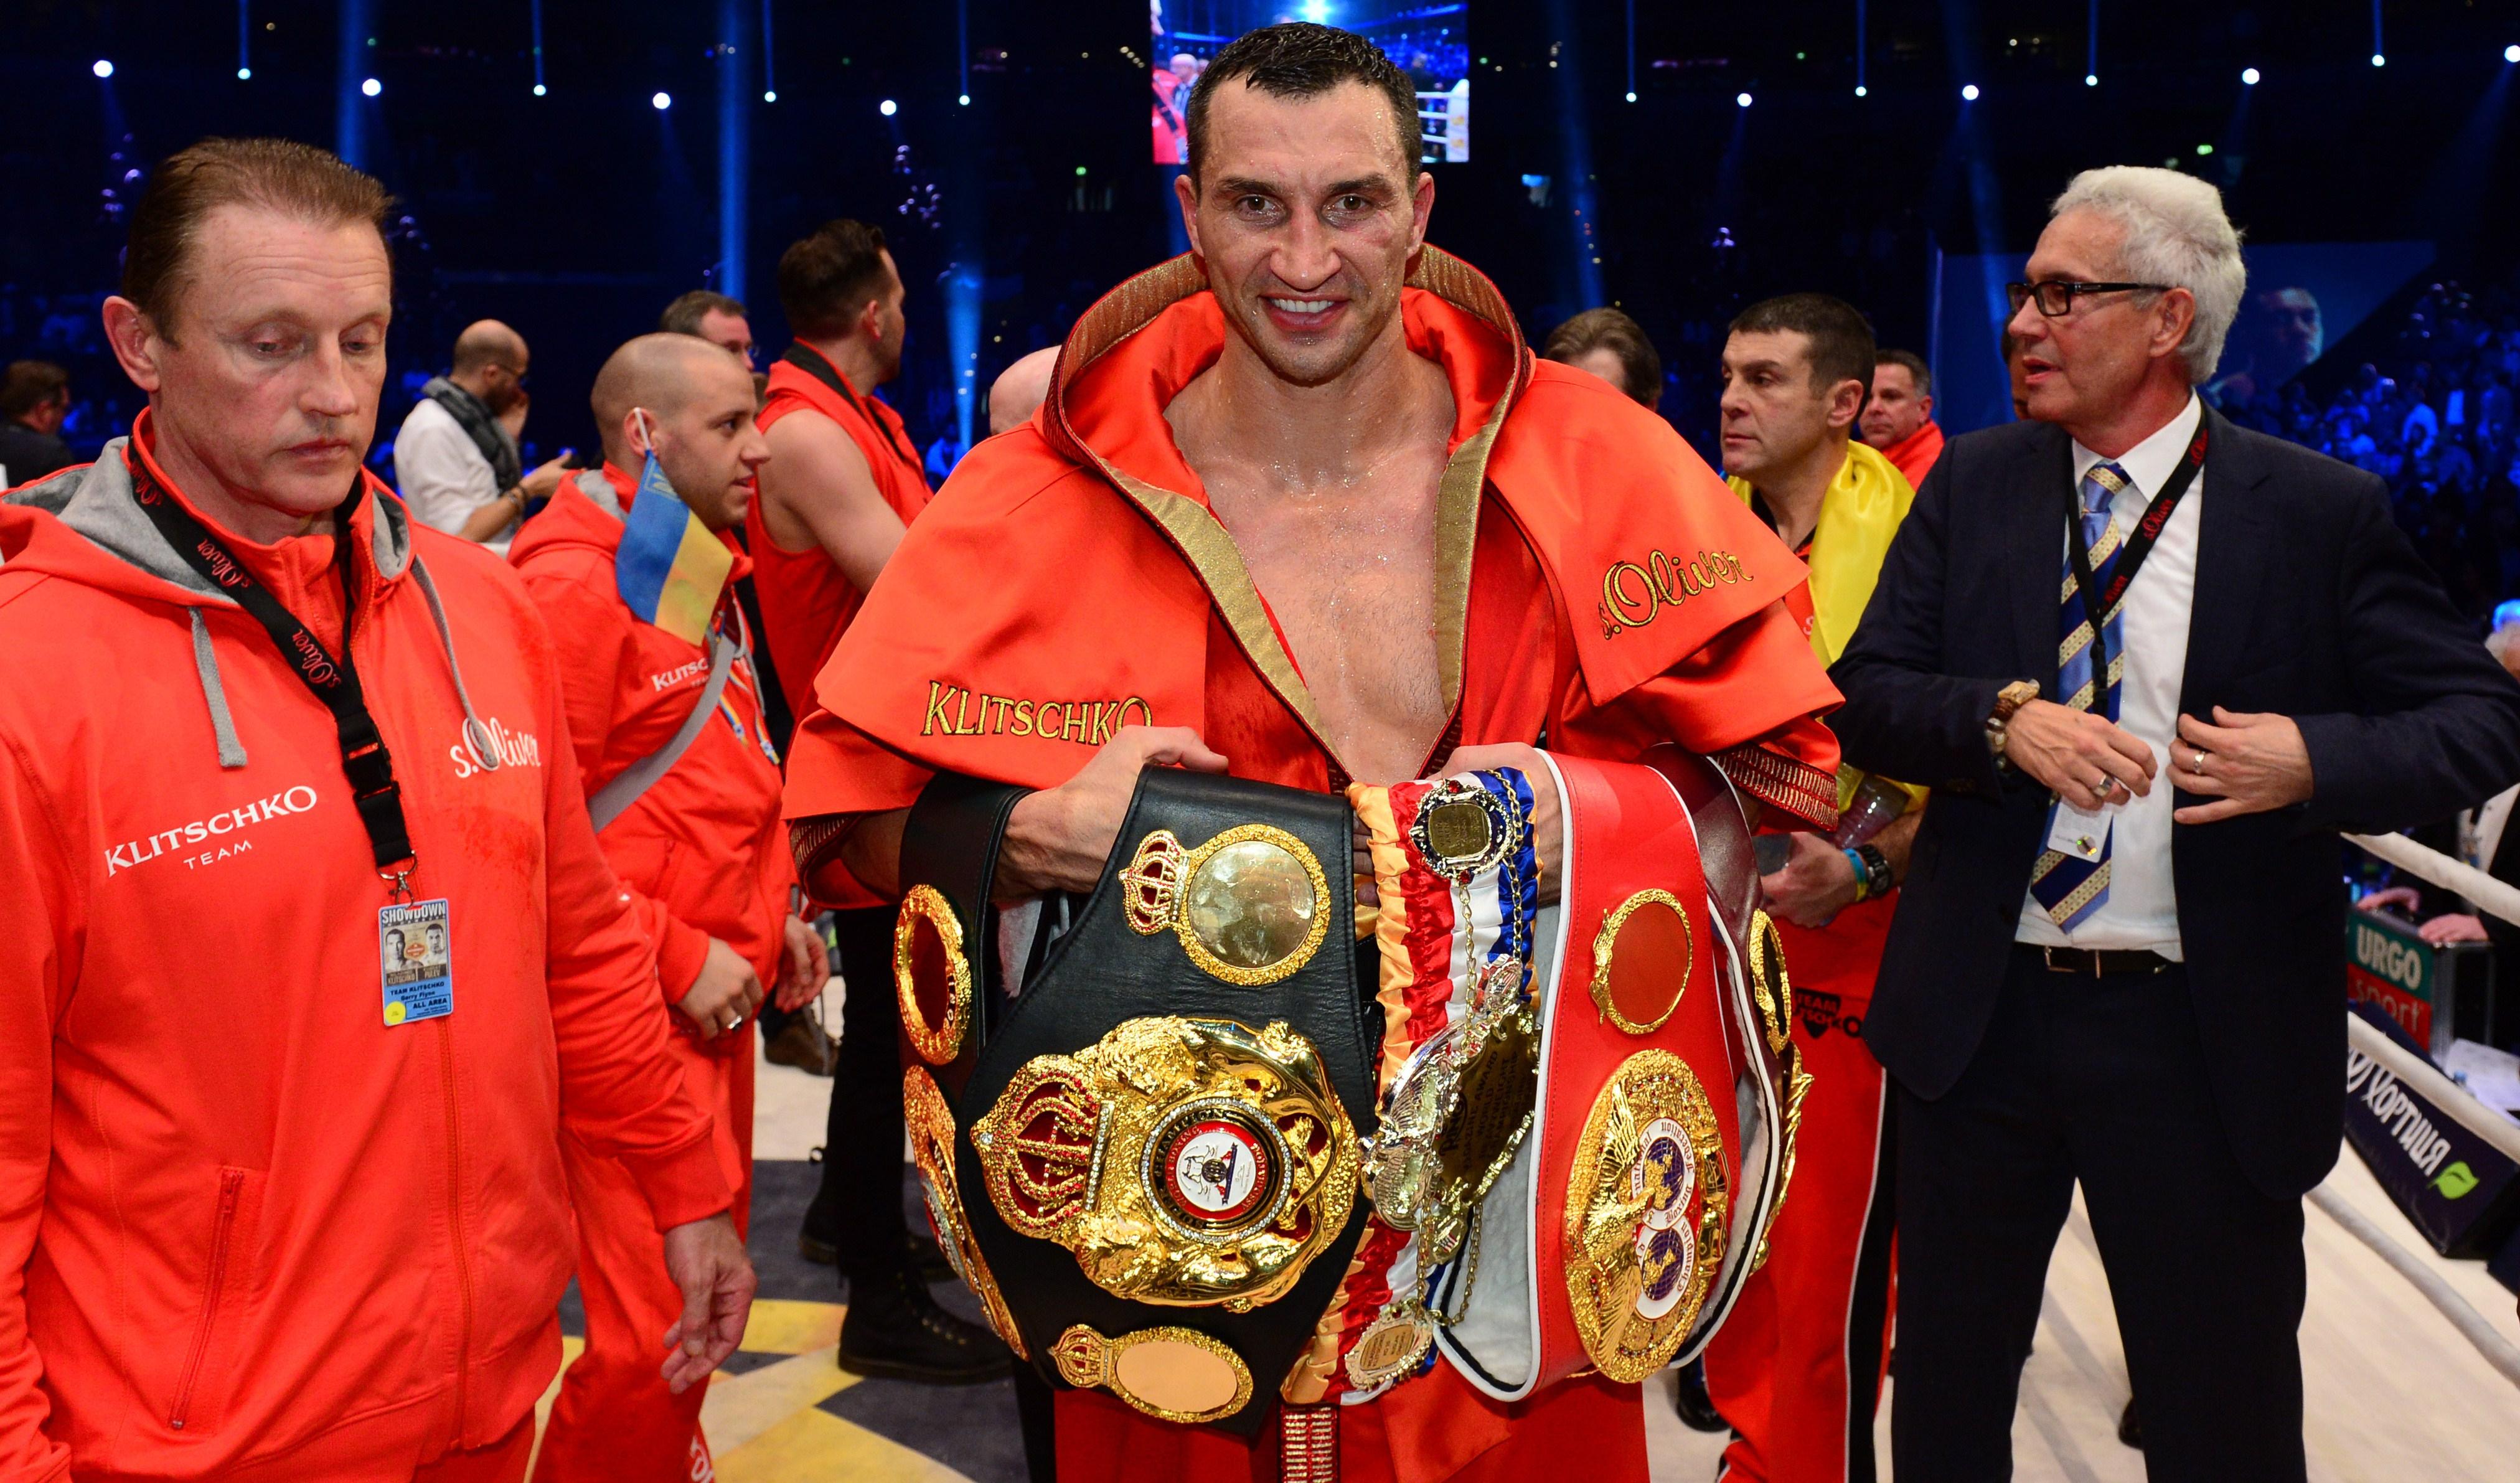 Ukrainian heavyweight boxing world champion Wladimir Klitschko poses with his titles. (Getty)